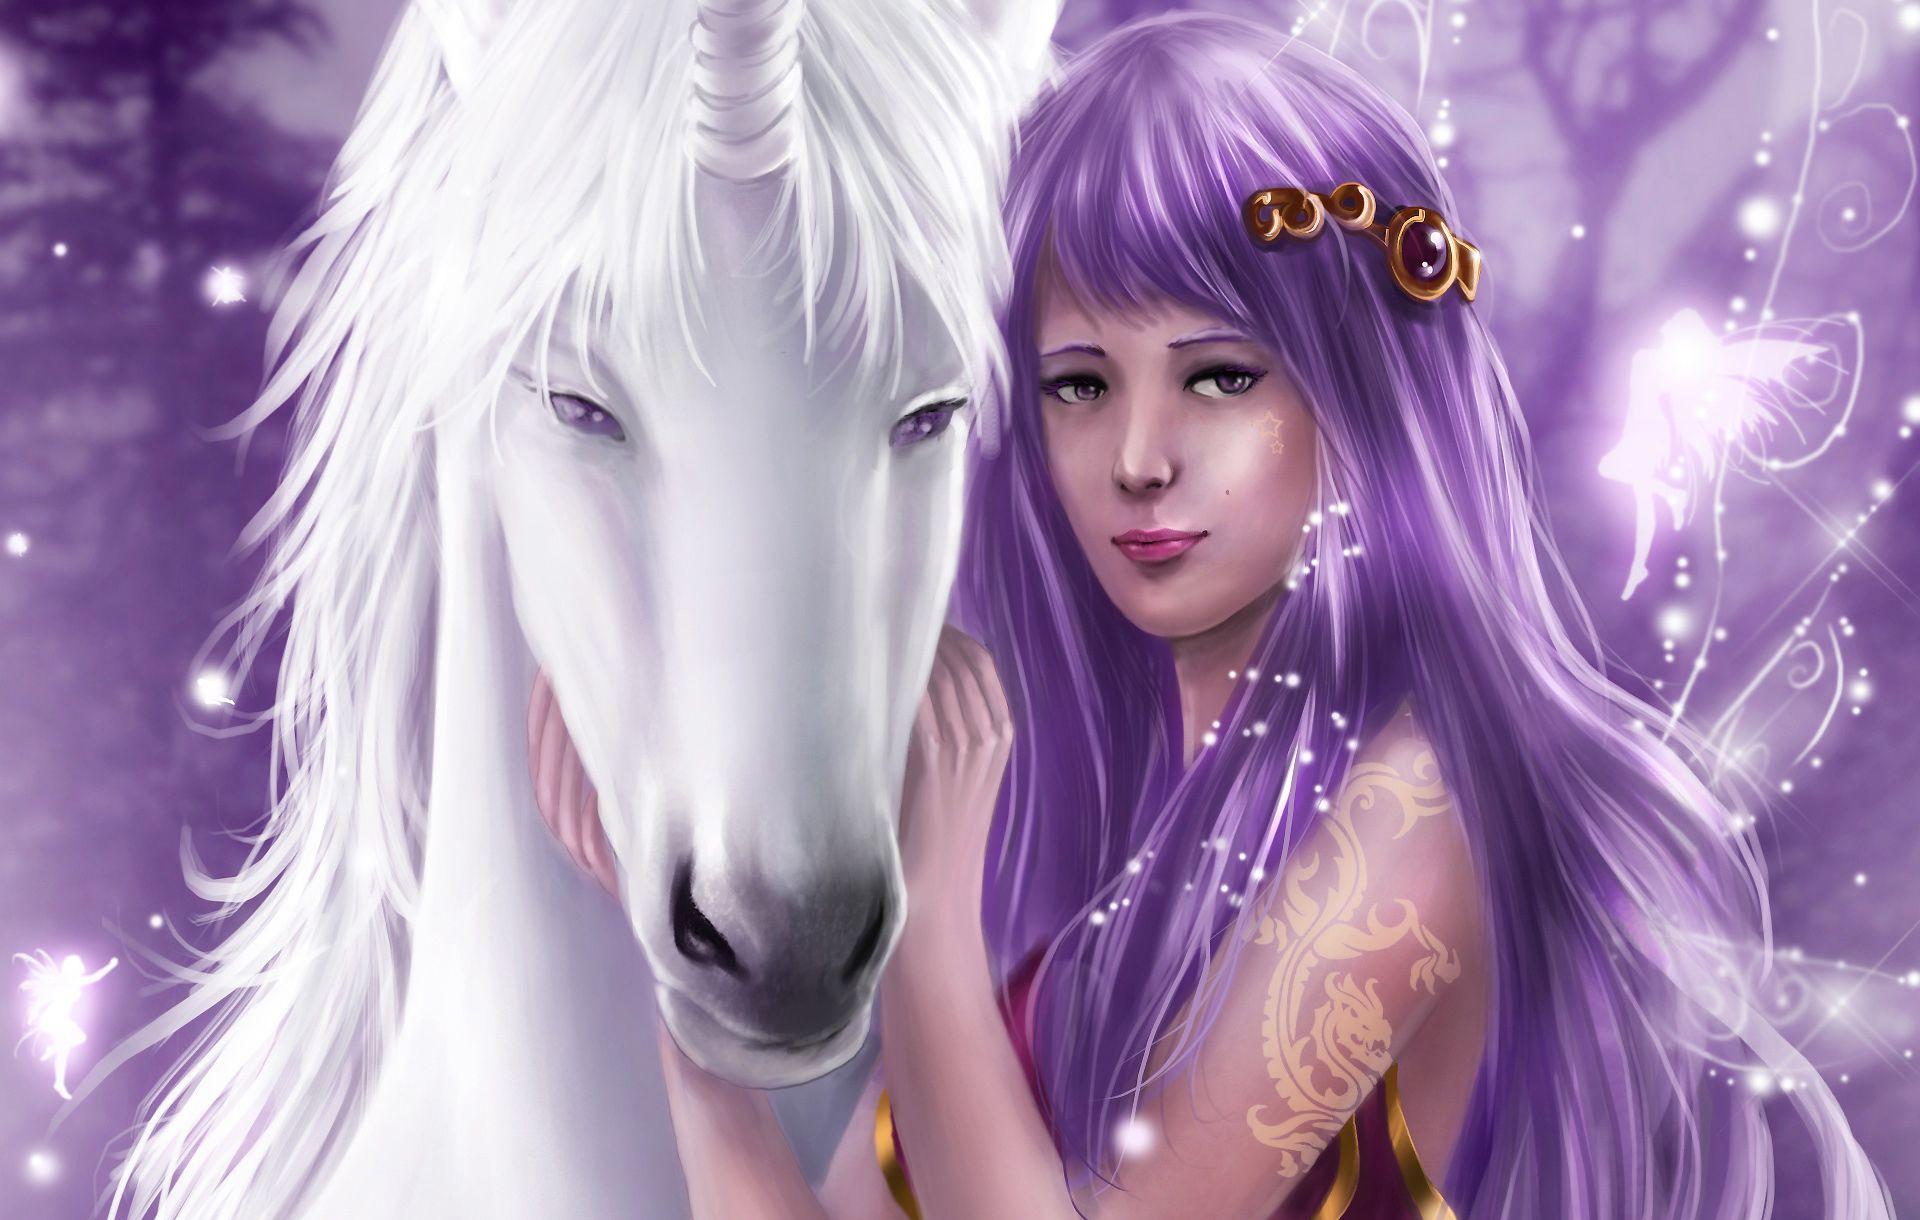 Fantasy Fairy Unicorn Wallpaper Fairy wallpaper